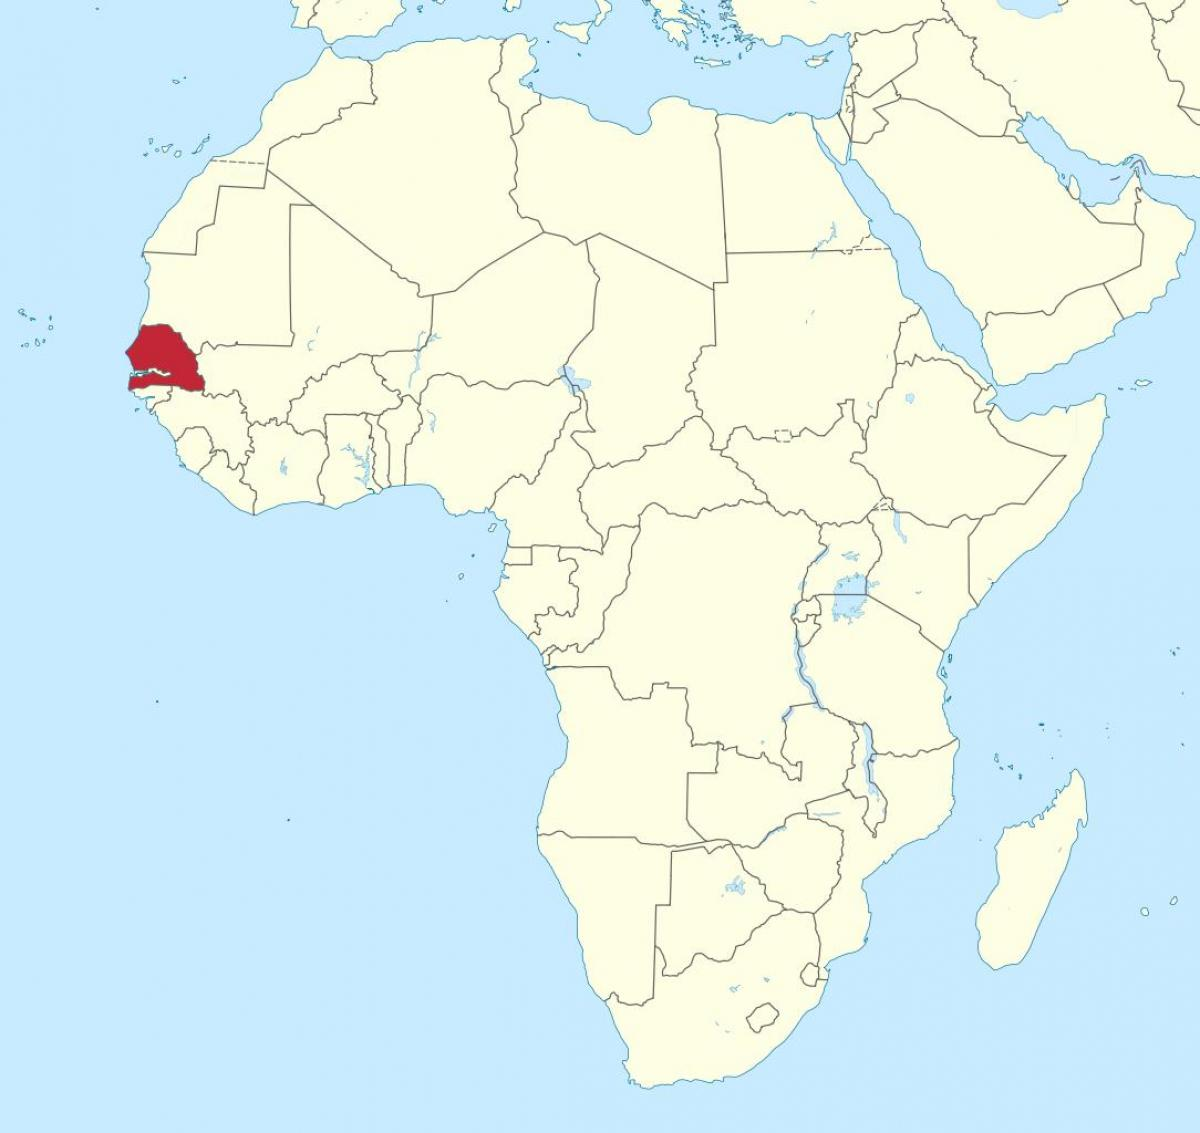 Senegal Mapa Afryki Senegal Na Mapie Afryki Afryka Zachodnia